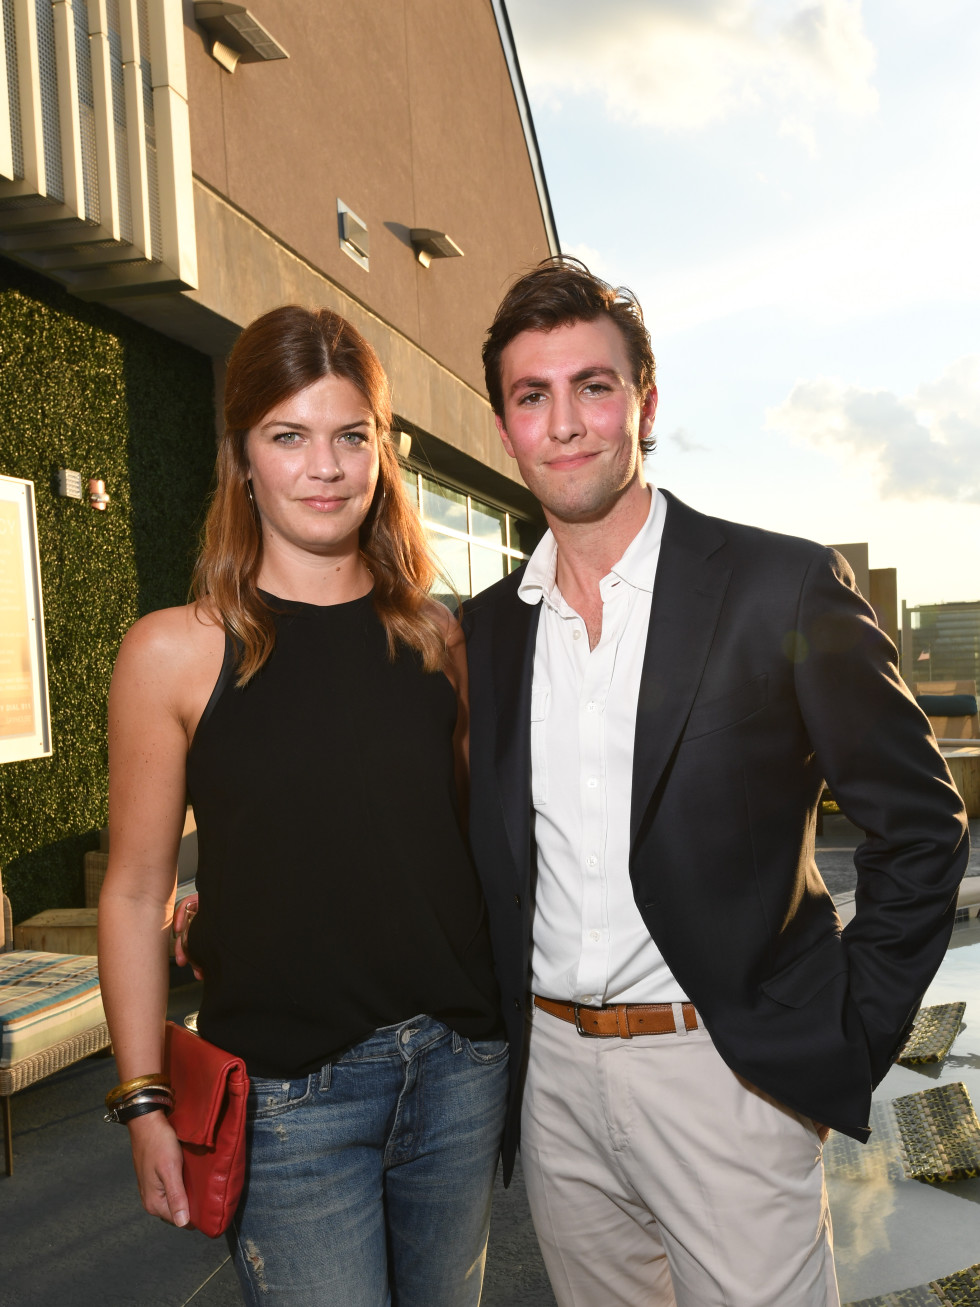 Laura Parsons, Matt Vandever at Sabores chef party